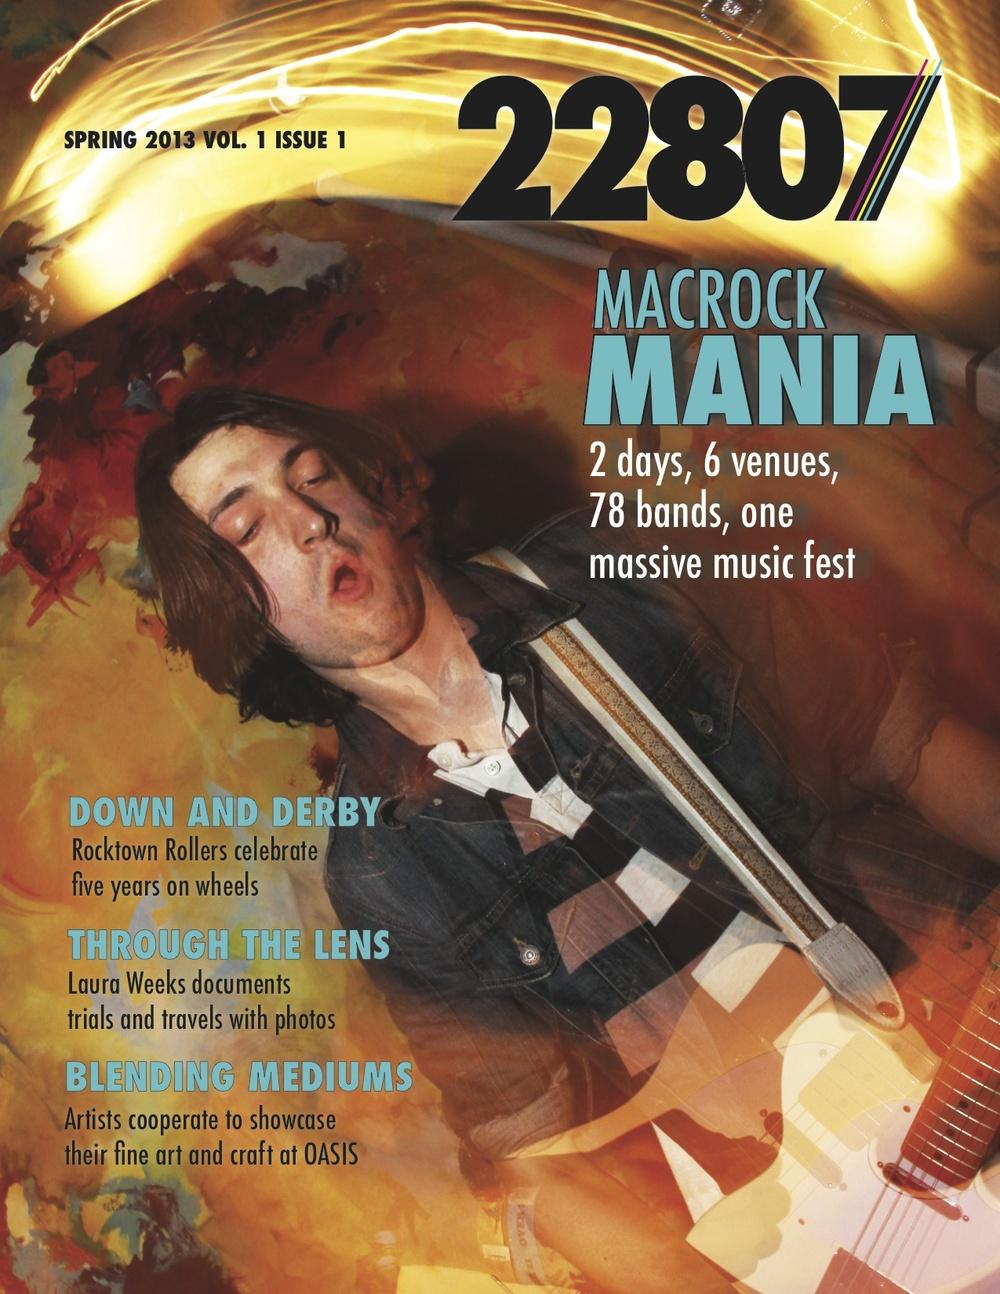 22807 Magazine